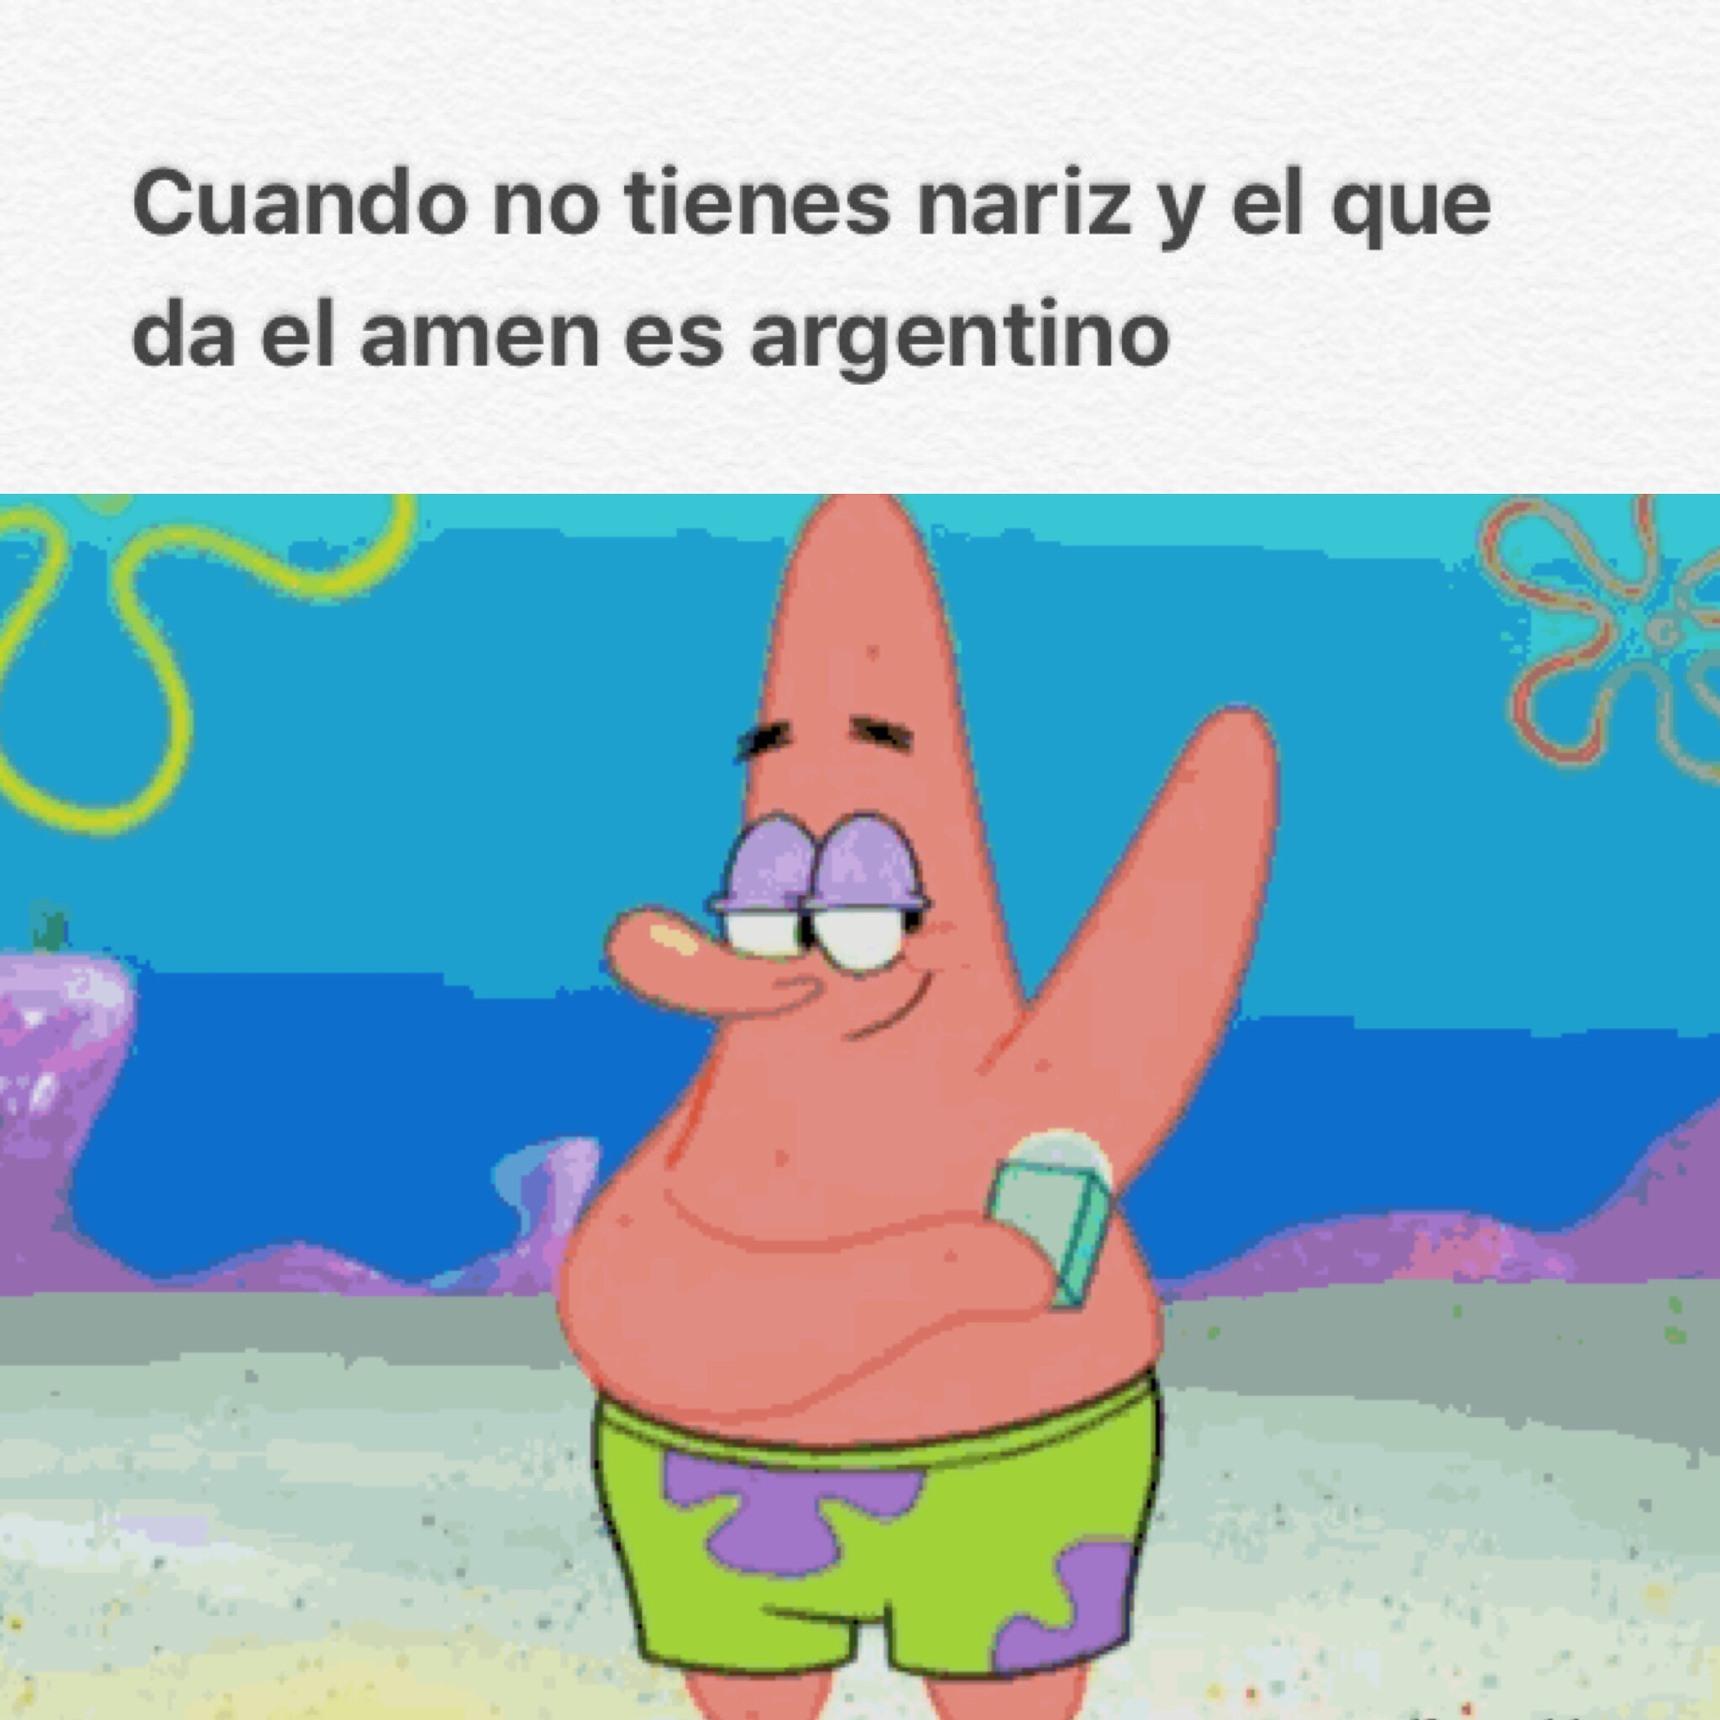 nargentina - meme